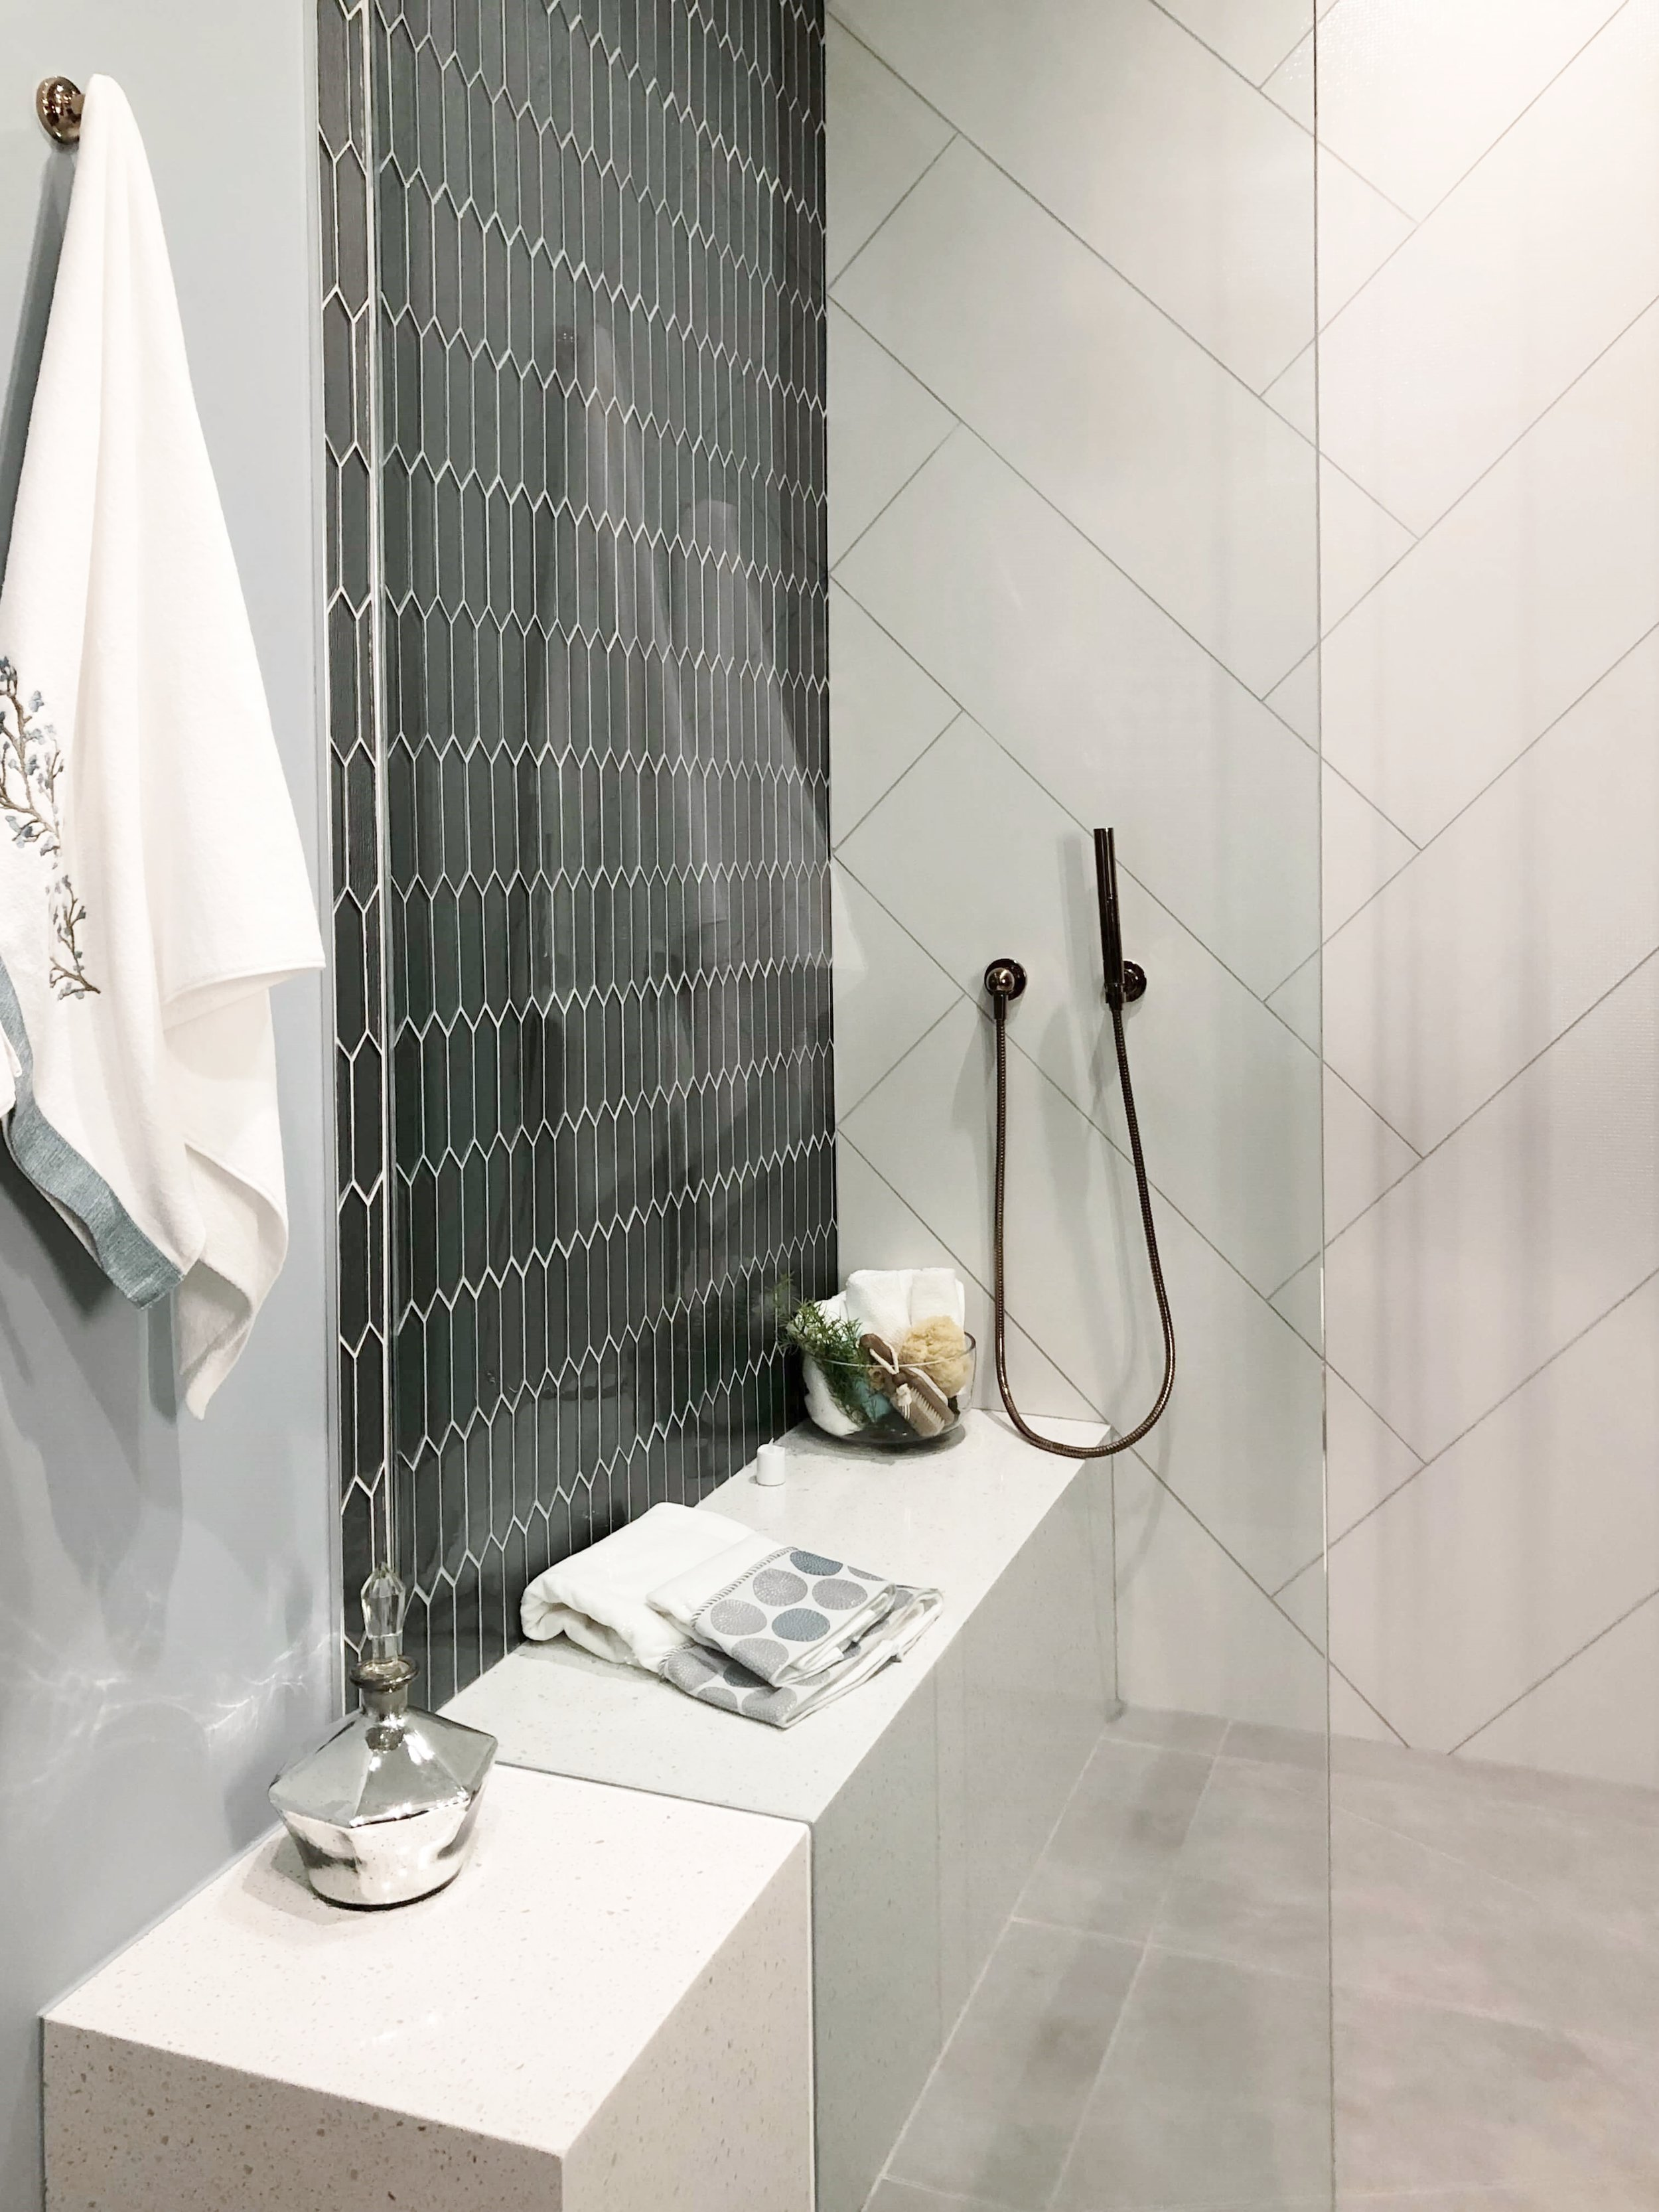 33 Sublime Super Sized Showers You Should Begin Saving Up For Designed